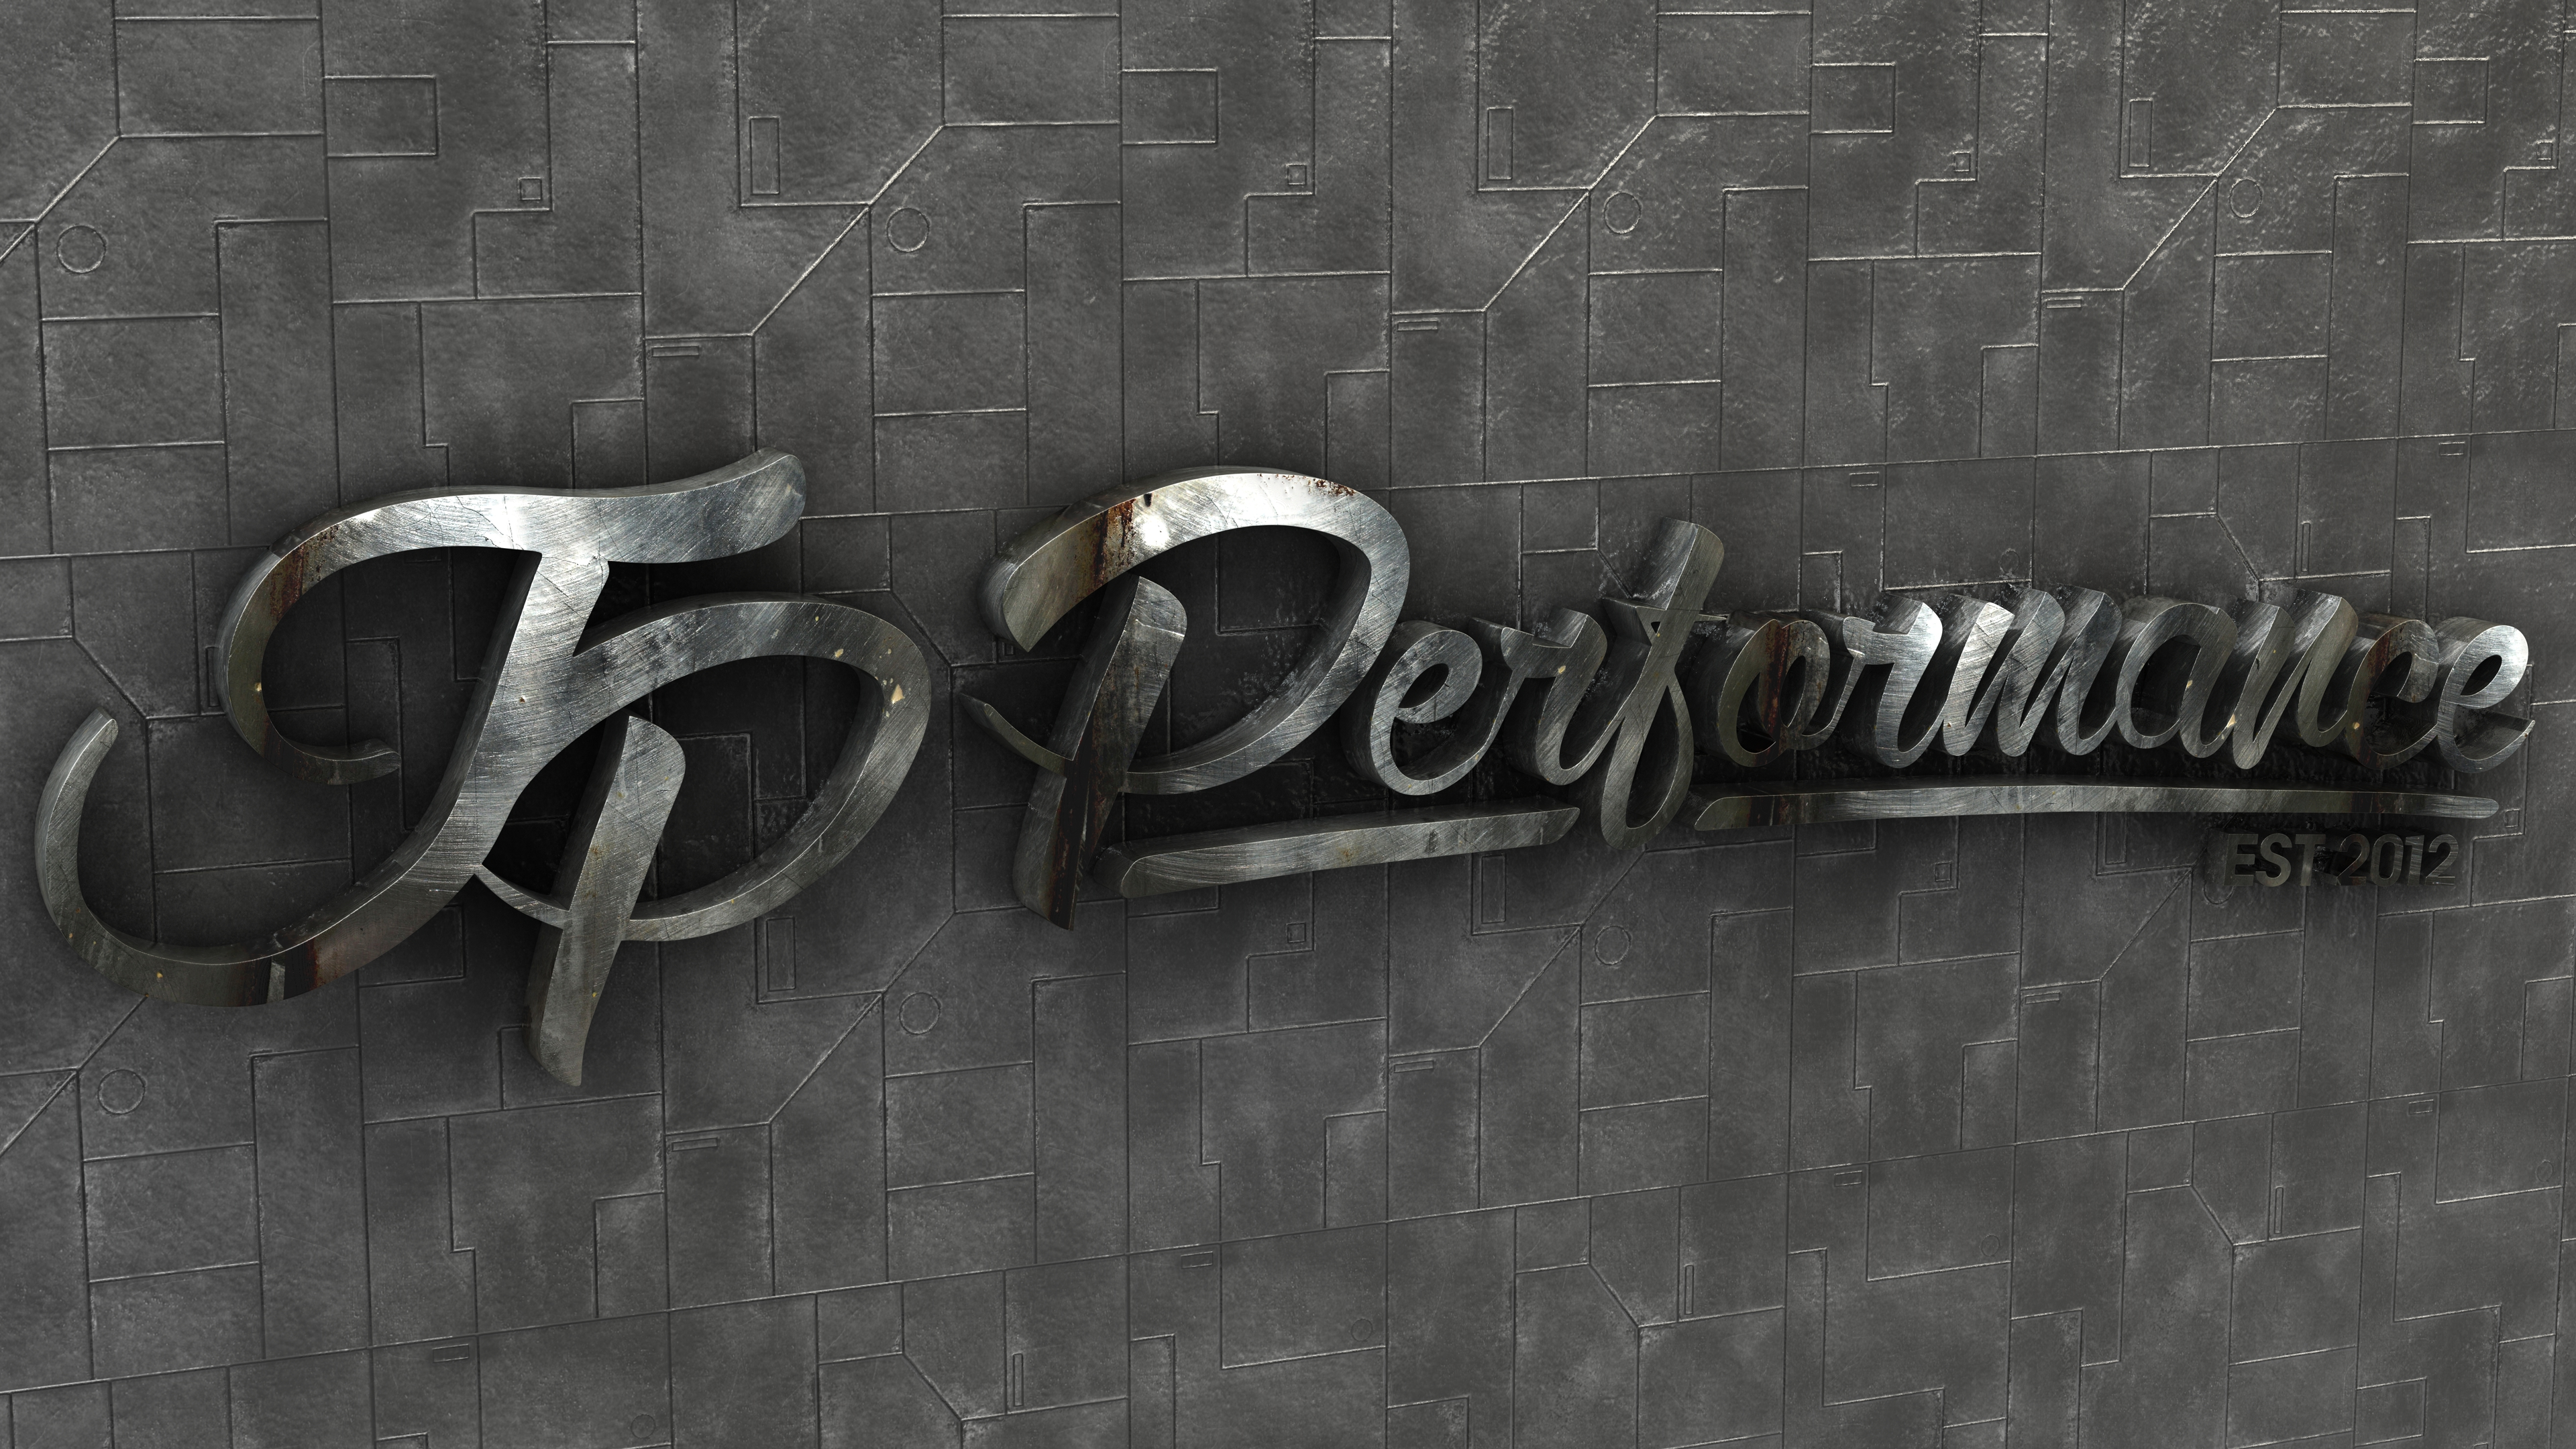 Jp Performance Industrial Logo By Dracu Teufel666 On